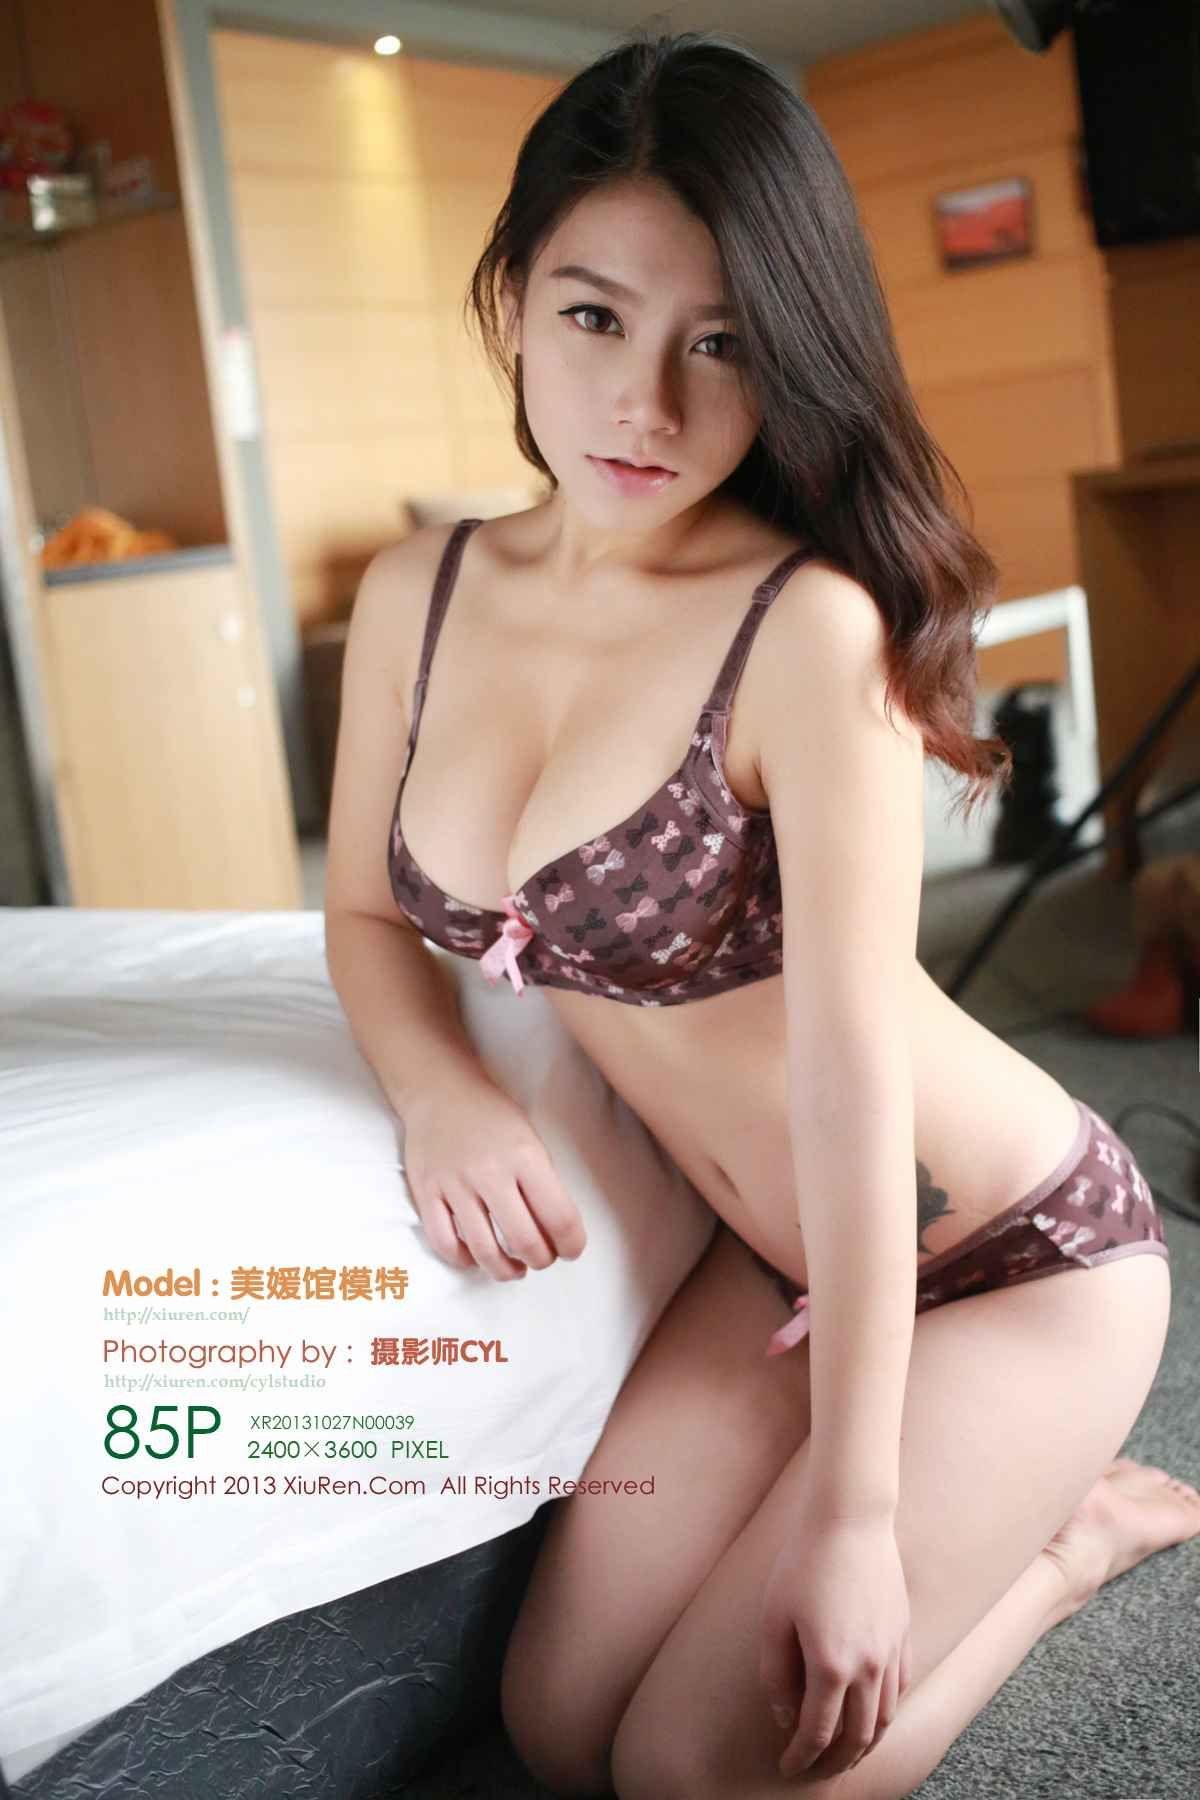 efced5f687a58ee6b153a3f9b30dd3d0 - Xiuren Hot Girl Nude